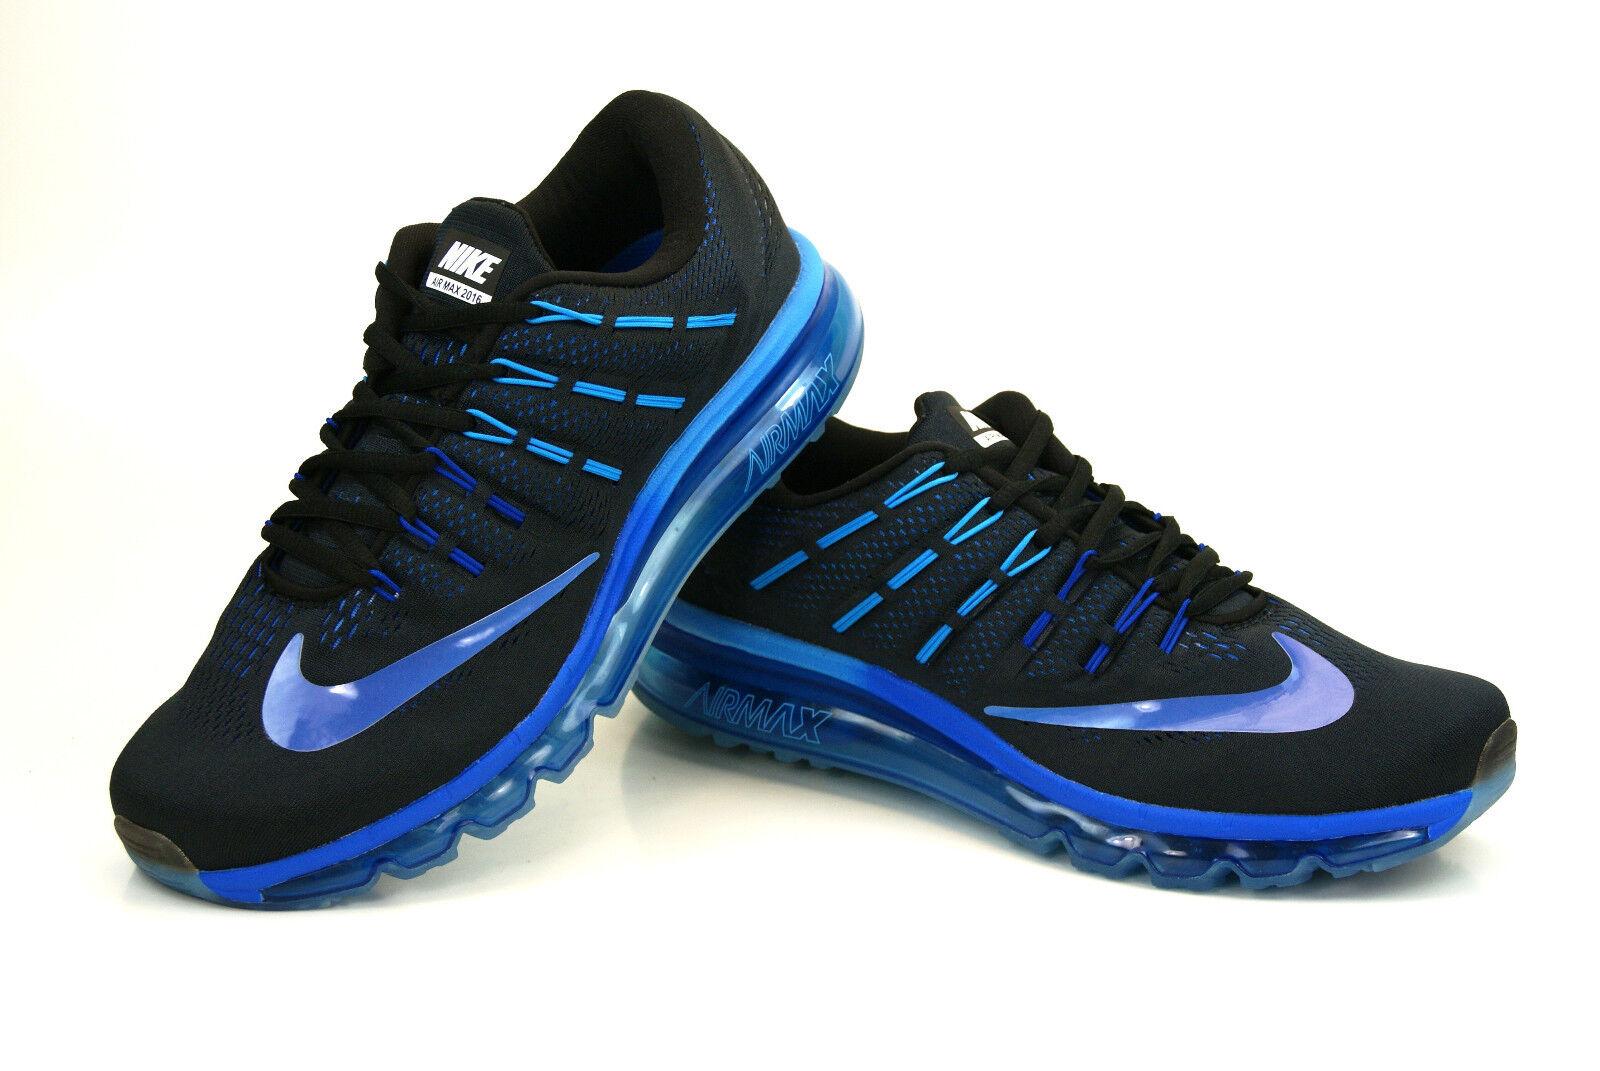 Nike Air Max 2016 scarpe da ginnastica ginnastica ginnastica Scarpe scarpe da ginnastica Scarpe Sportive Uomo 806771 4ee5f3